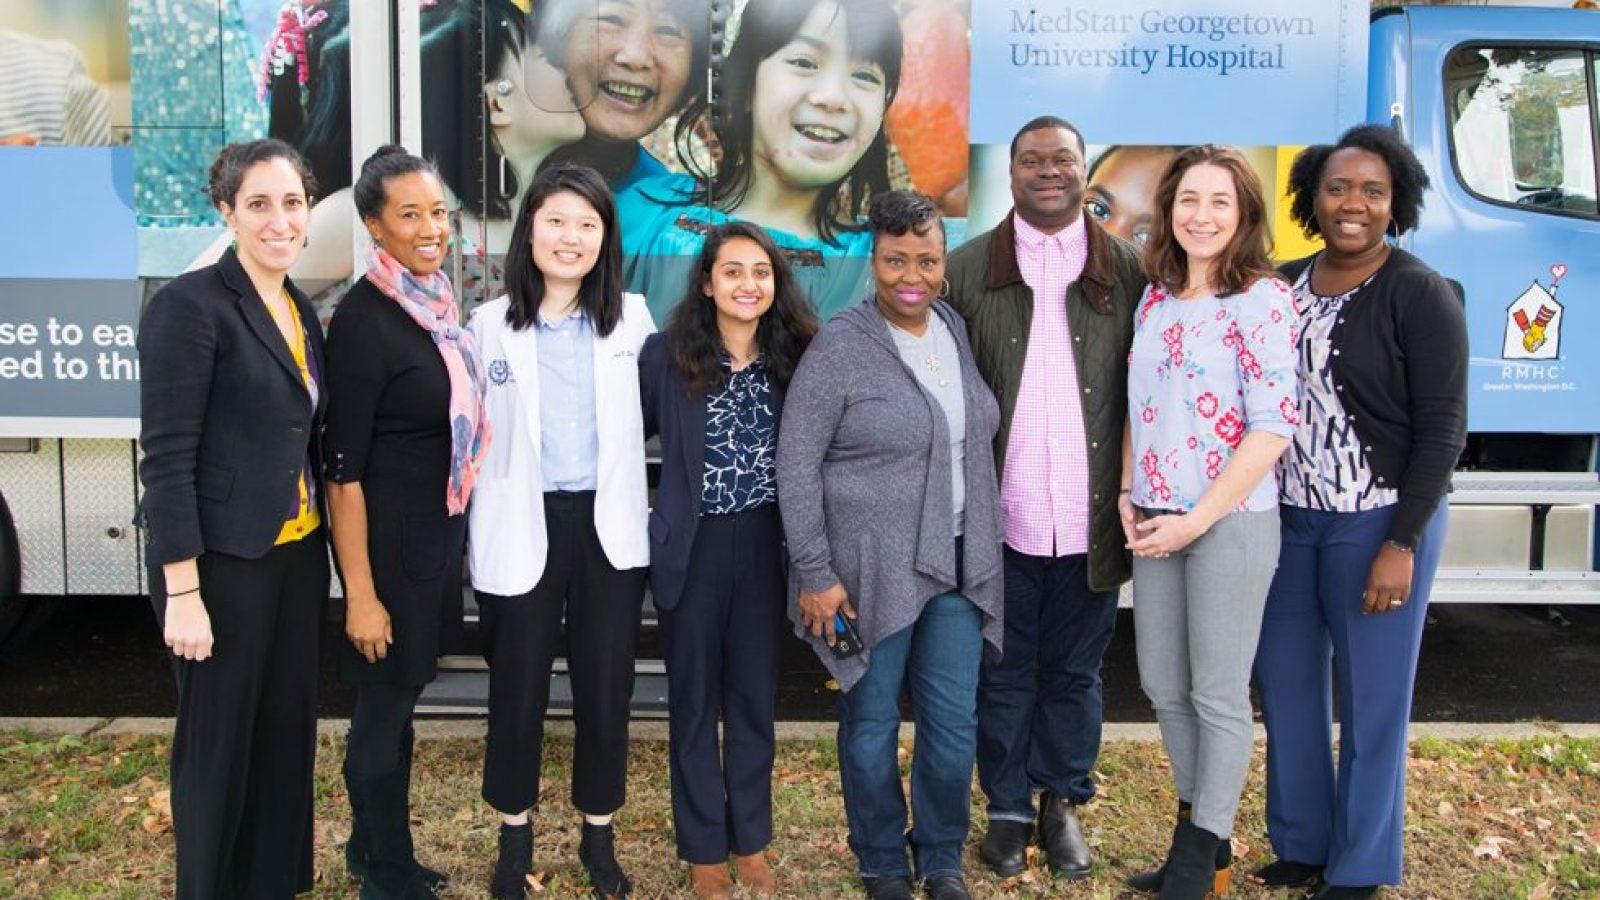 From left: Associate Professor Yael Cannon, Dr. Ana Caskin, Janet Shin (M'20), Prashasti Bhatnagar (L'22), Ella Barnes-Williams, Scott Grissett, Janine Rethy and Joanne Odom